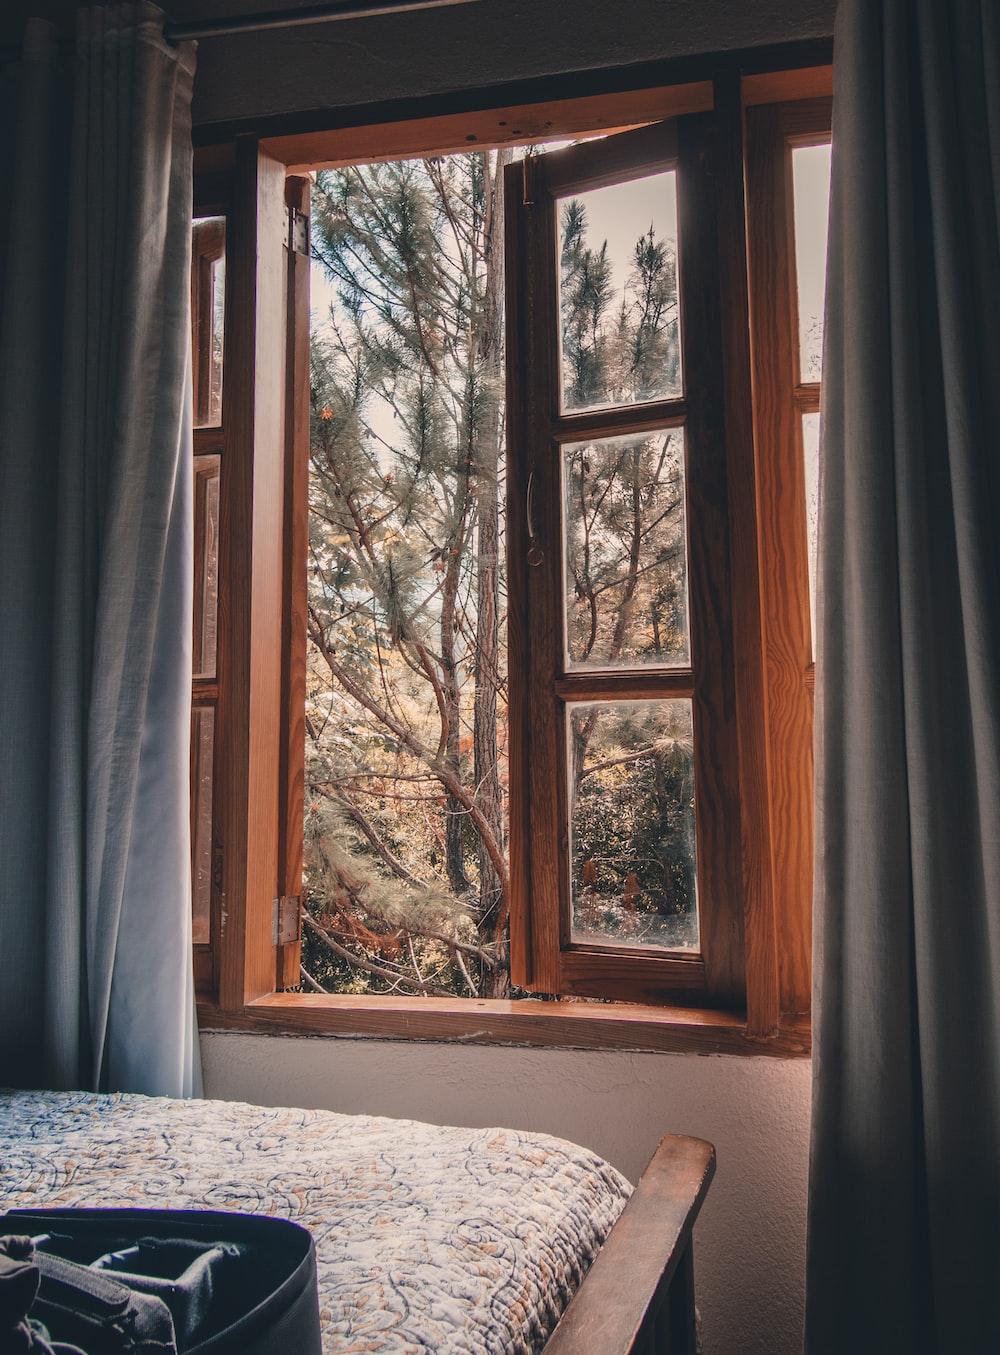 white window curtain near white wooden framed glass window